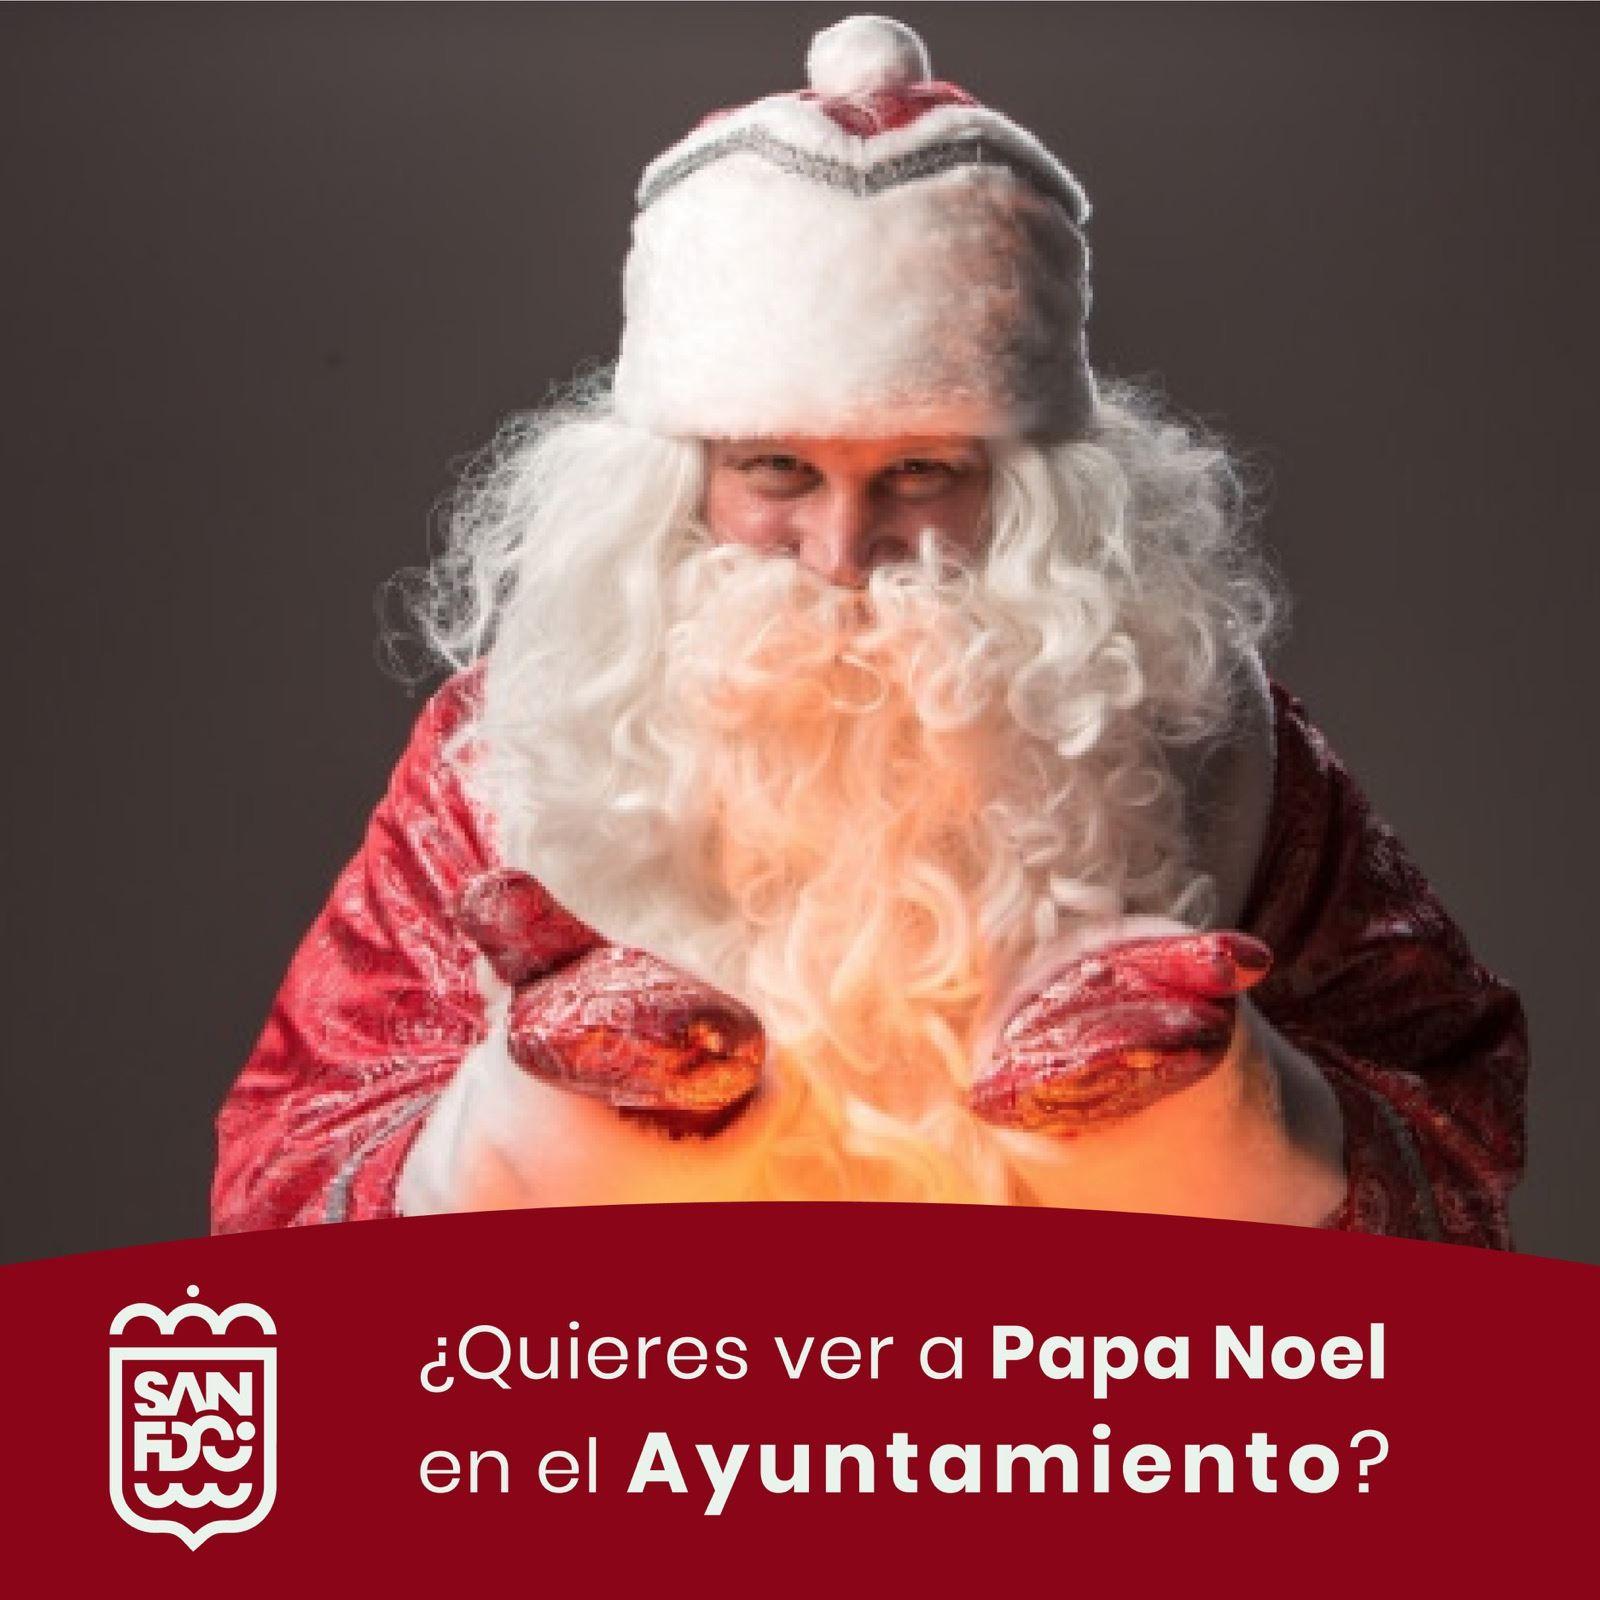 Papa Noel San Fernando Navidad 2020